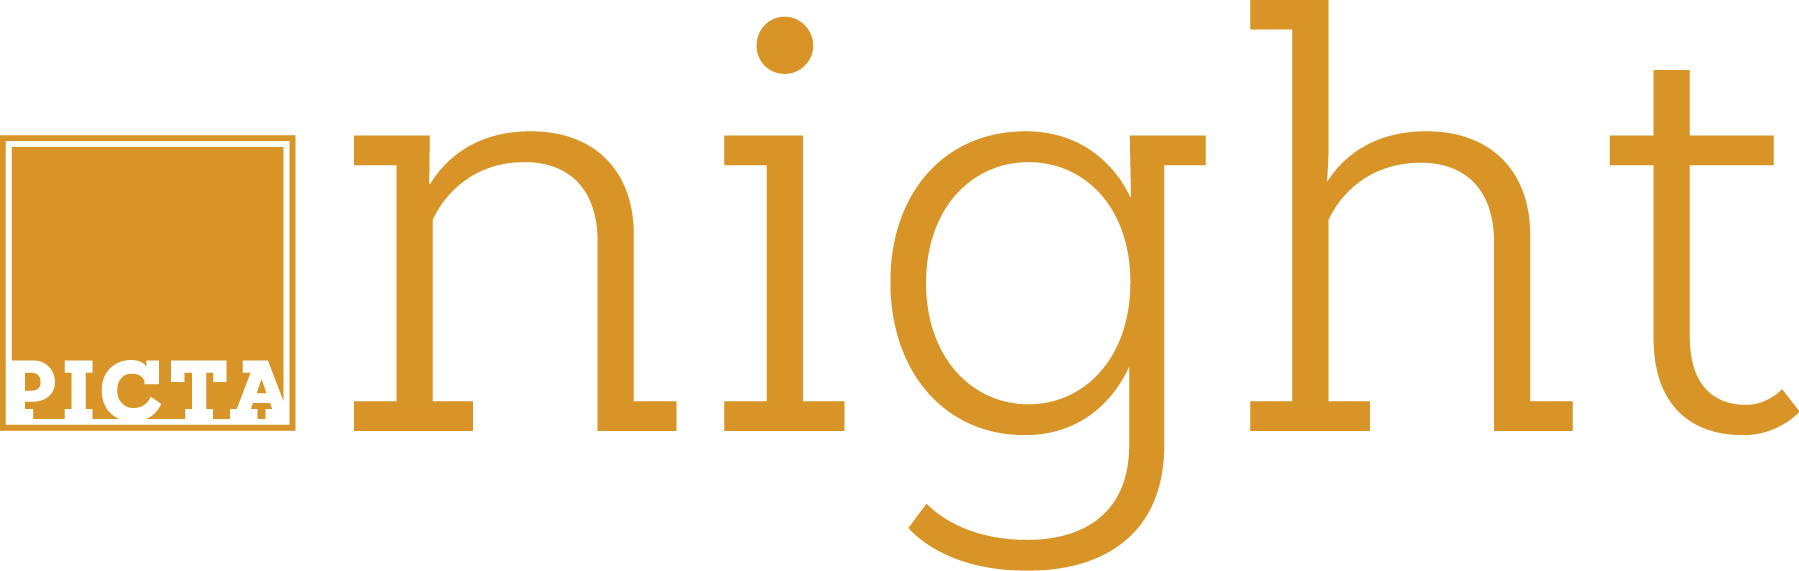 PICTAnight_logo